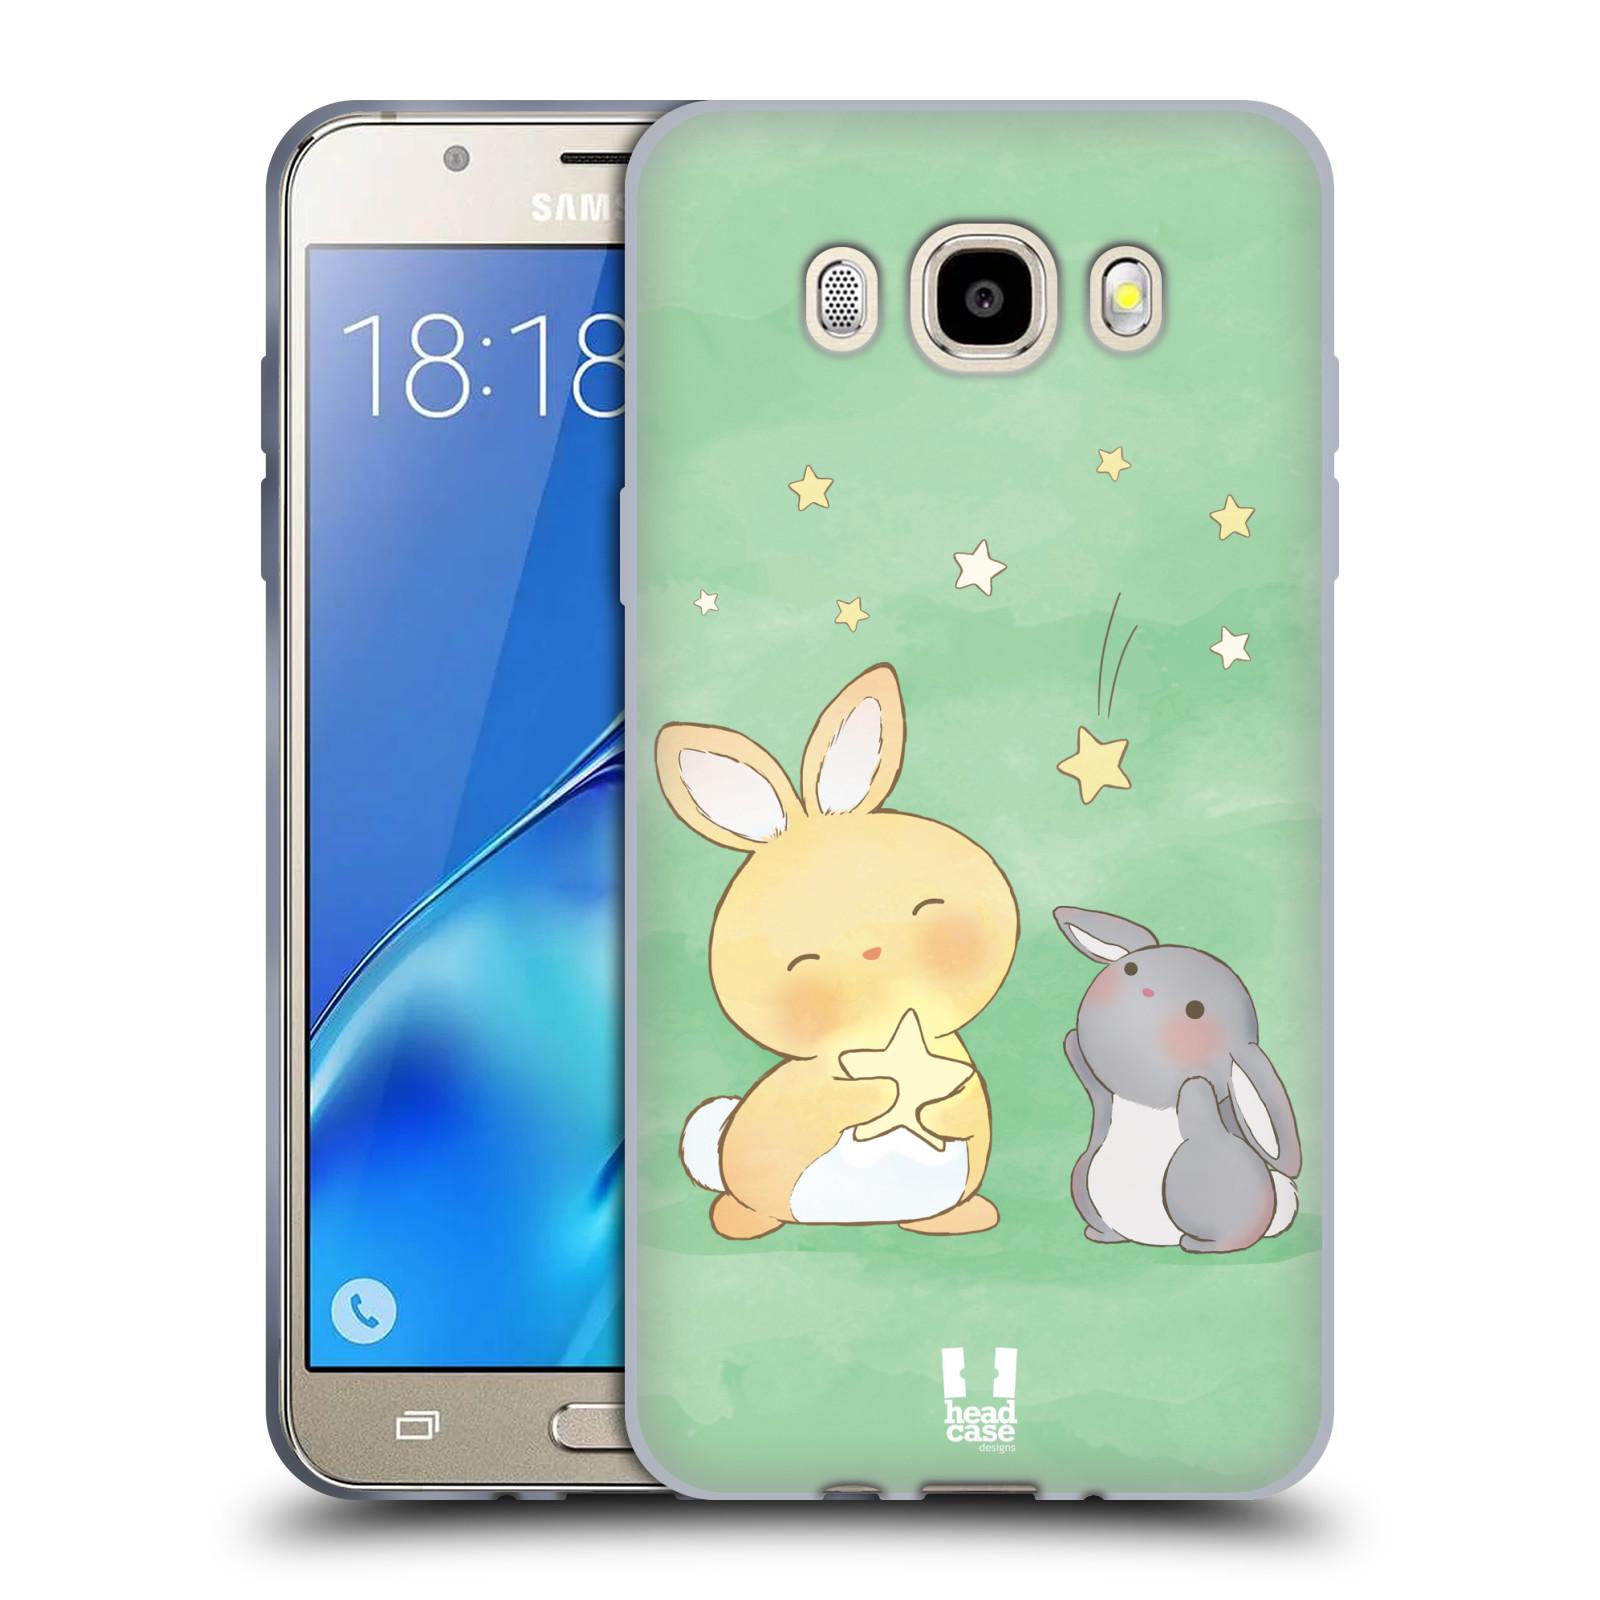 HEAD CASE silikonový obal, kryt na mobil Samsung Galaxy J5 2016, J510, J510F, (J510F DUAL SIM) vzor králíček a hvězdy zelená